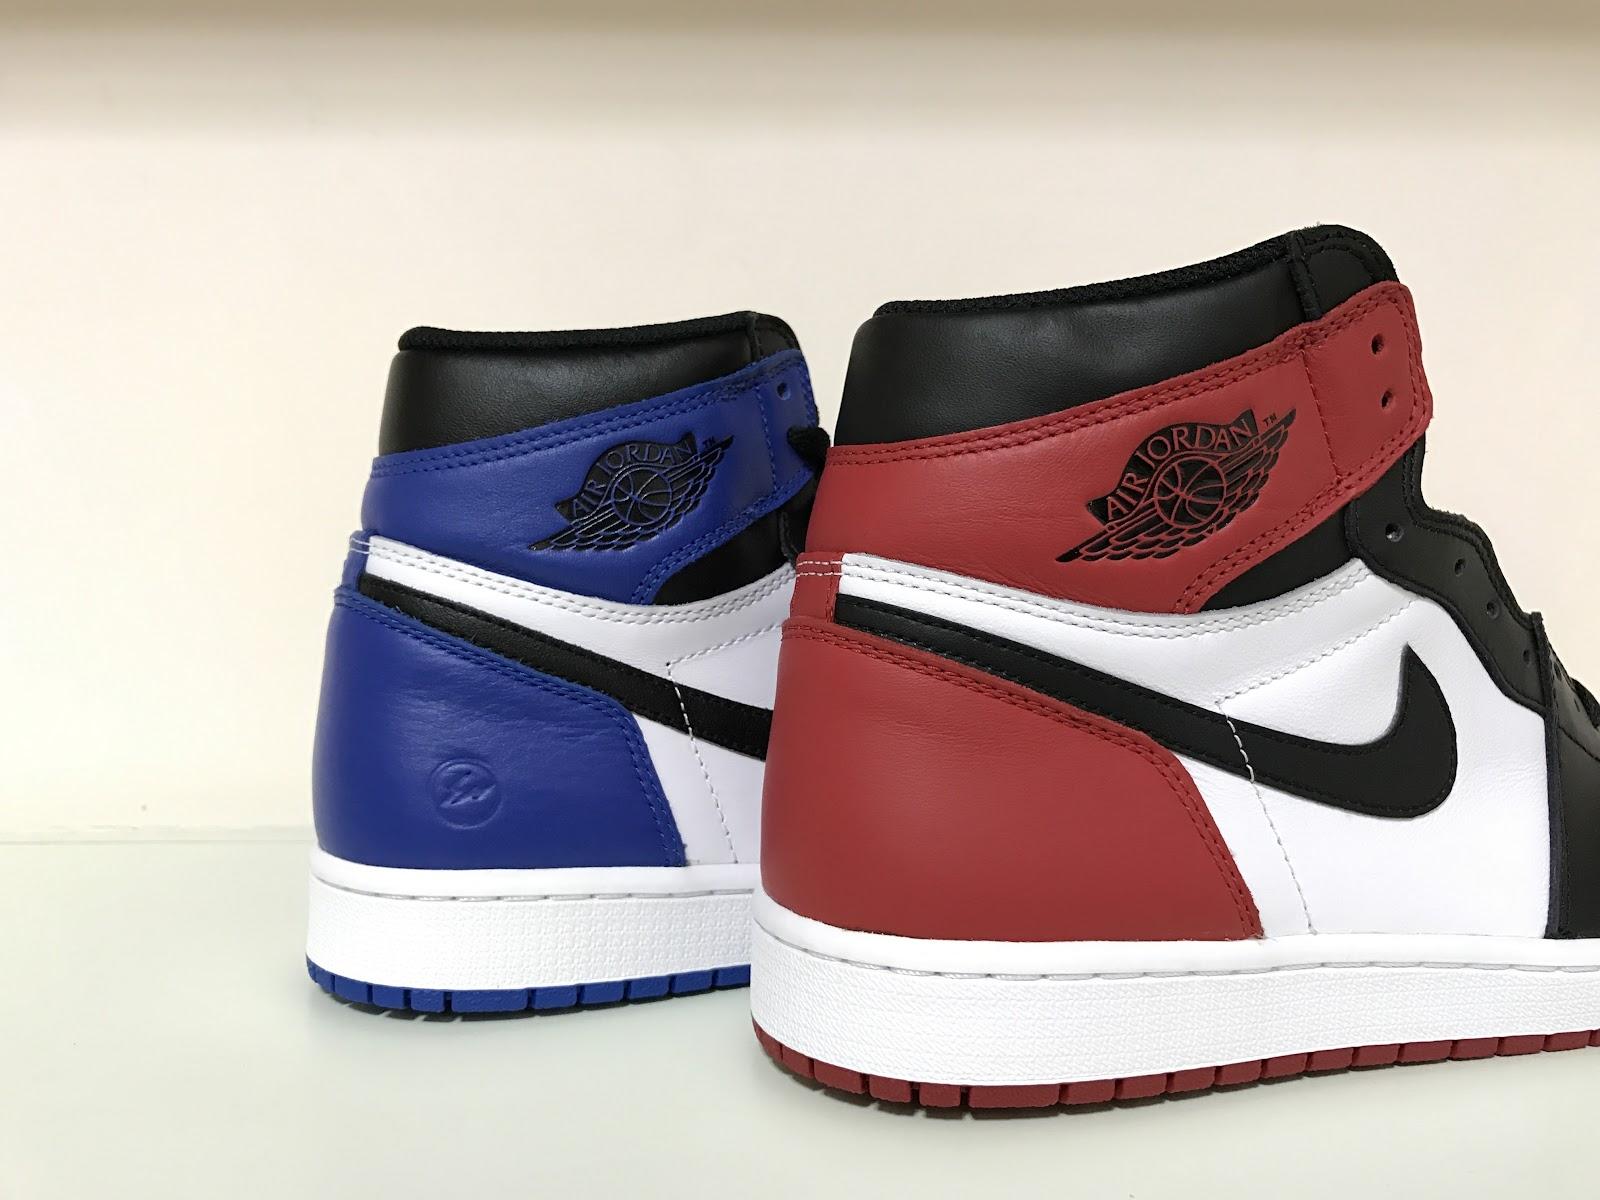 Nike Air Jordan 1 Retro High OG fragment vs. Black Toe - Way of Life ba6df9ecaada